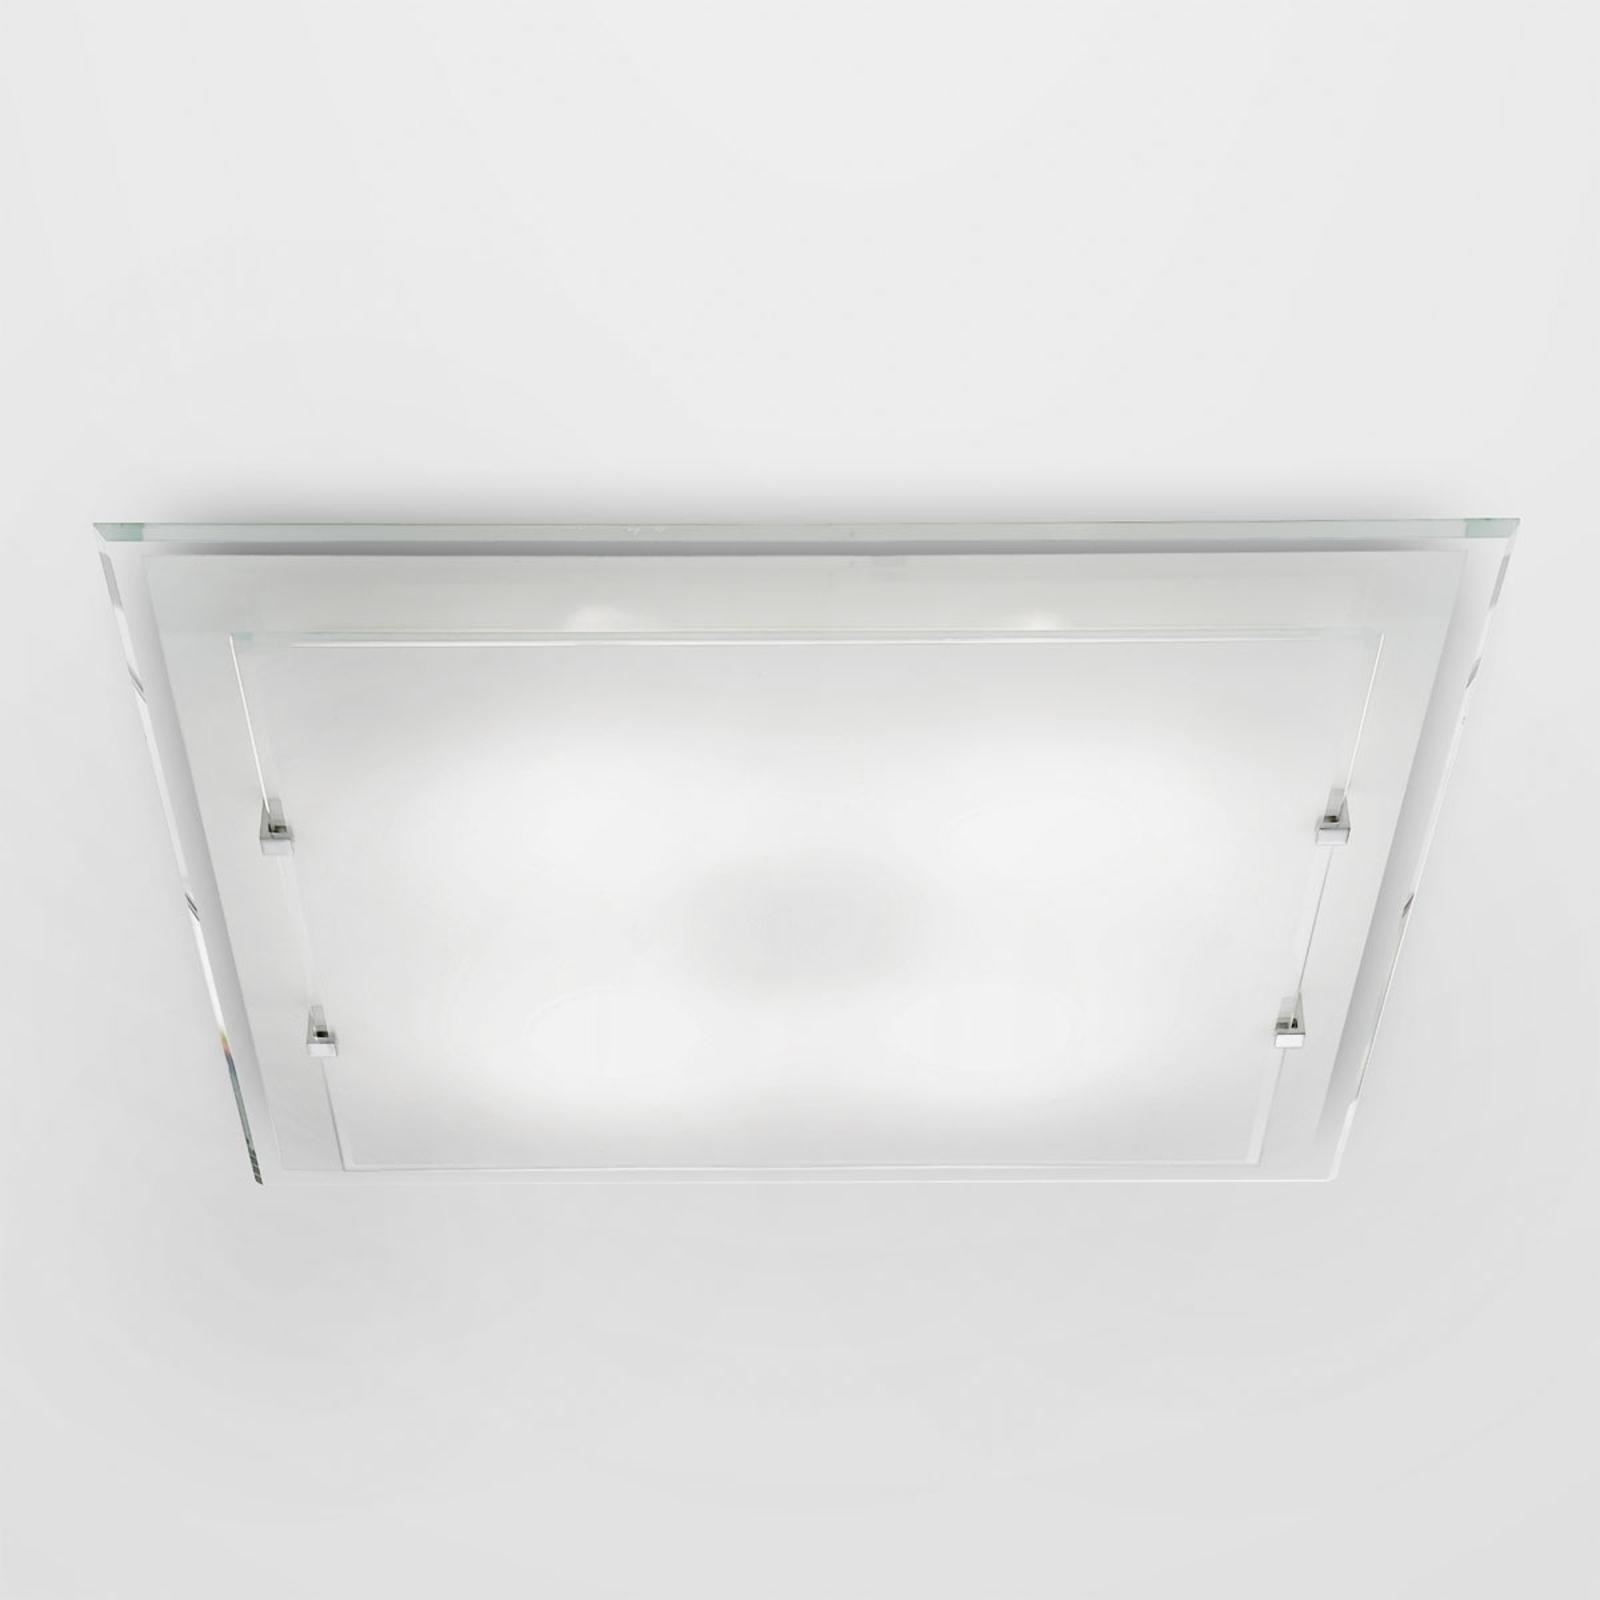 Vierkante plafondlamp Victoria, 40 x 40 cm